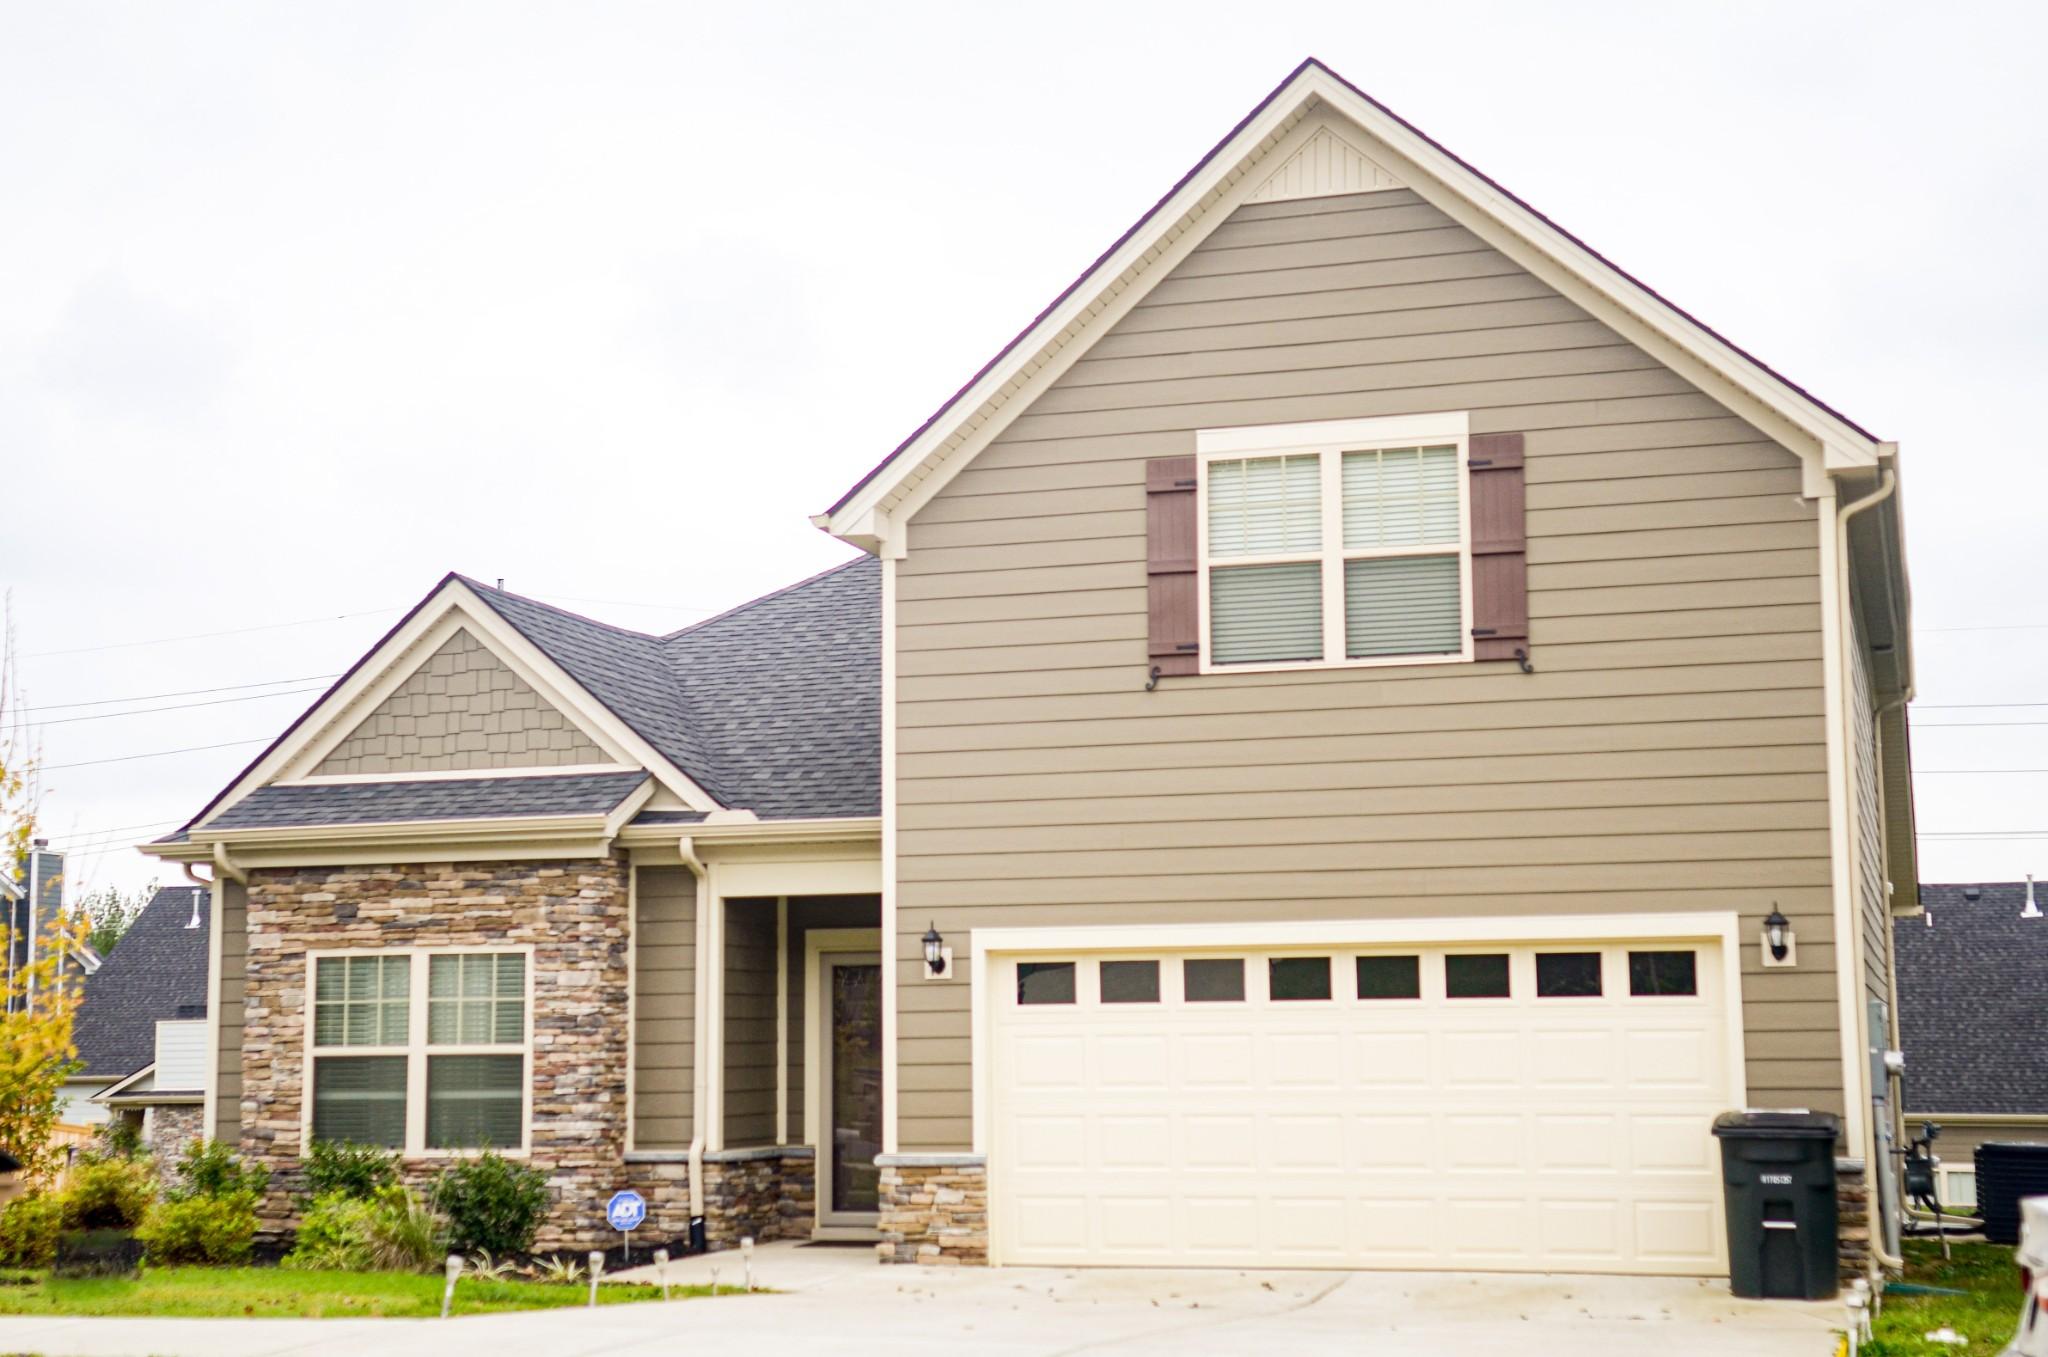 $322,900 - 3Br/3Ba -  for Sale in Vista, Whites Creek